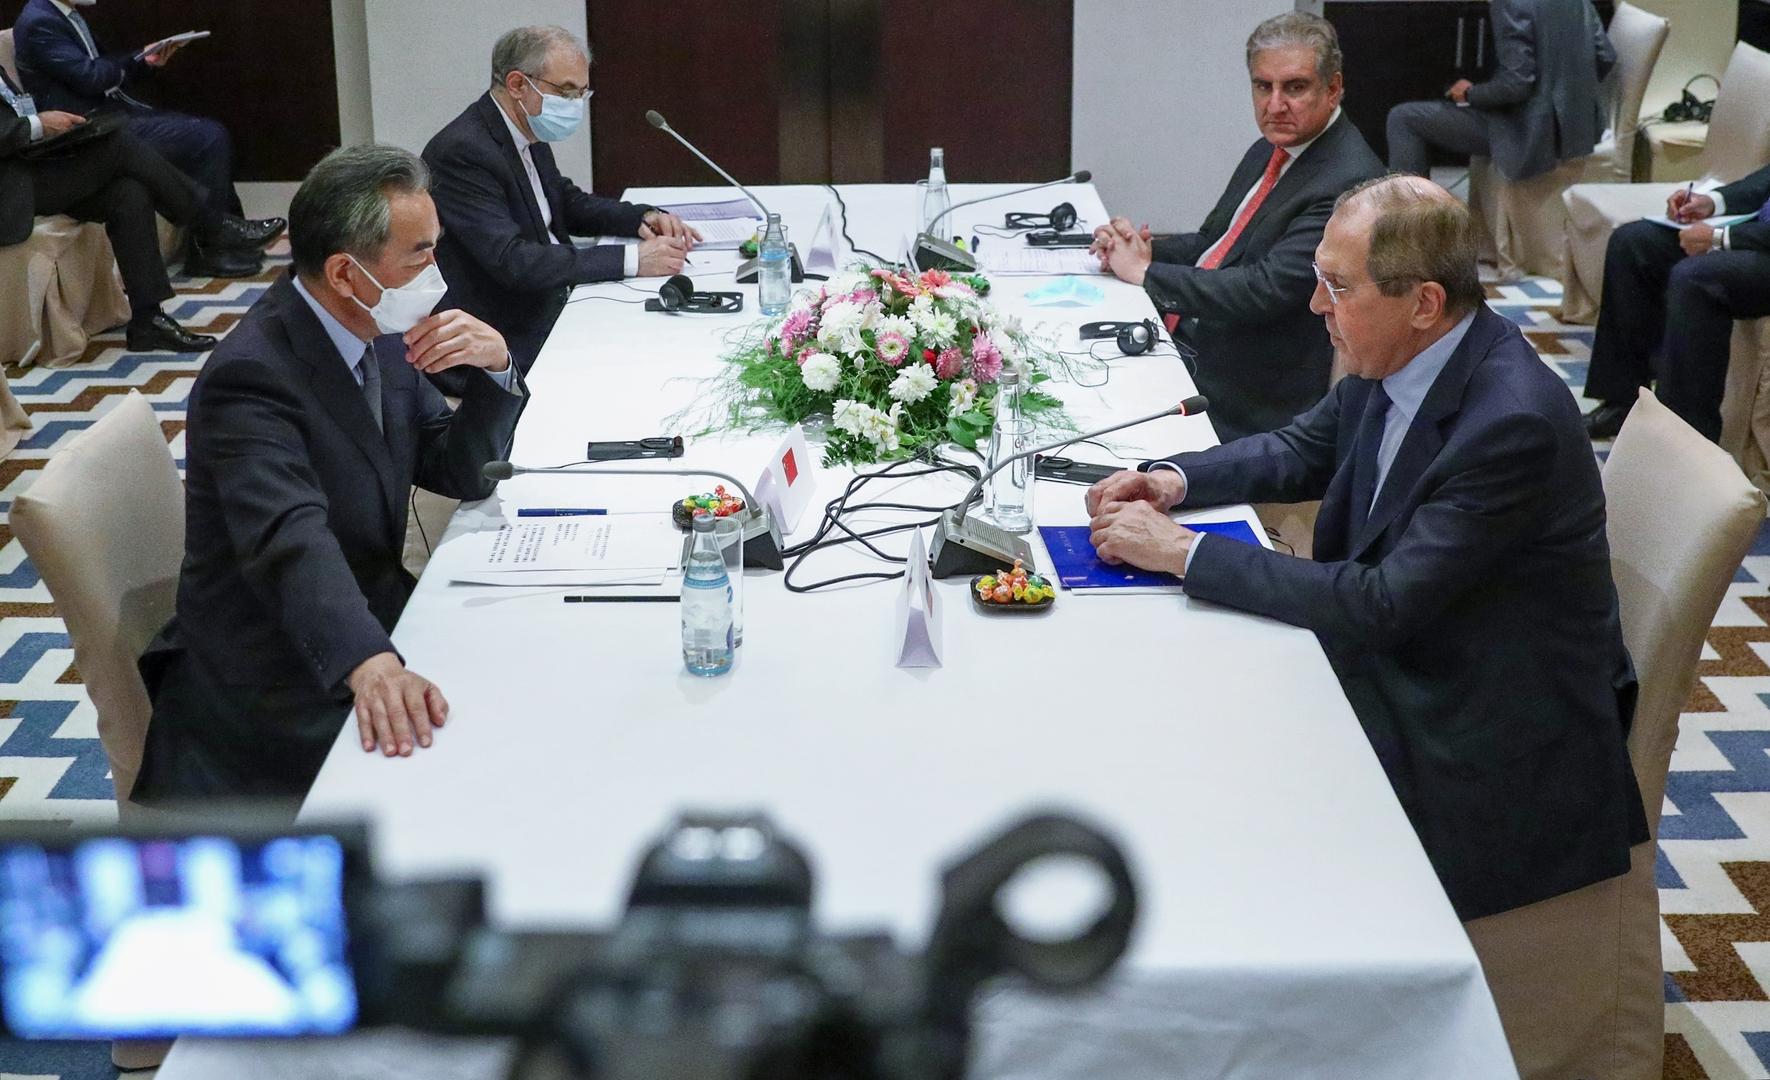 روسيا والصين وباكستان وإيران تنسق المواقف بشأن أفغانستان